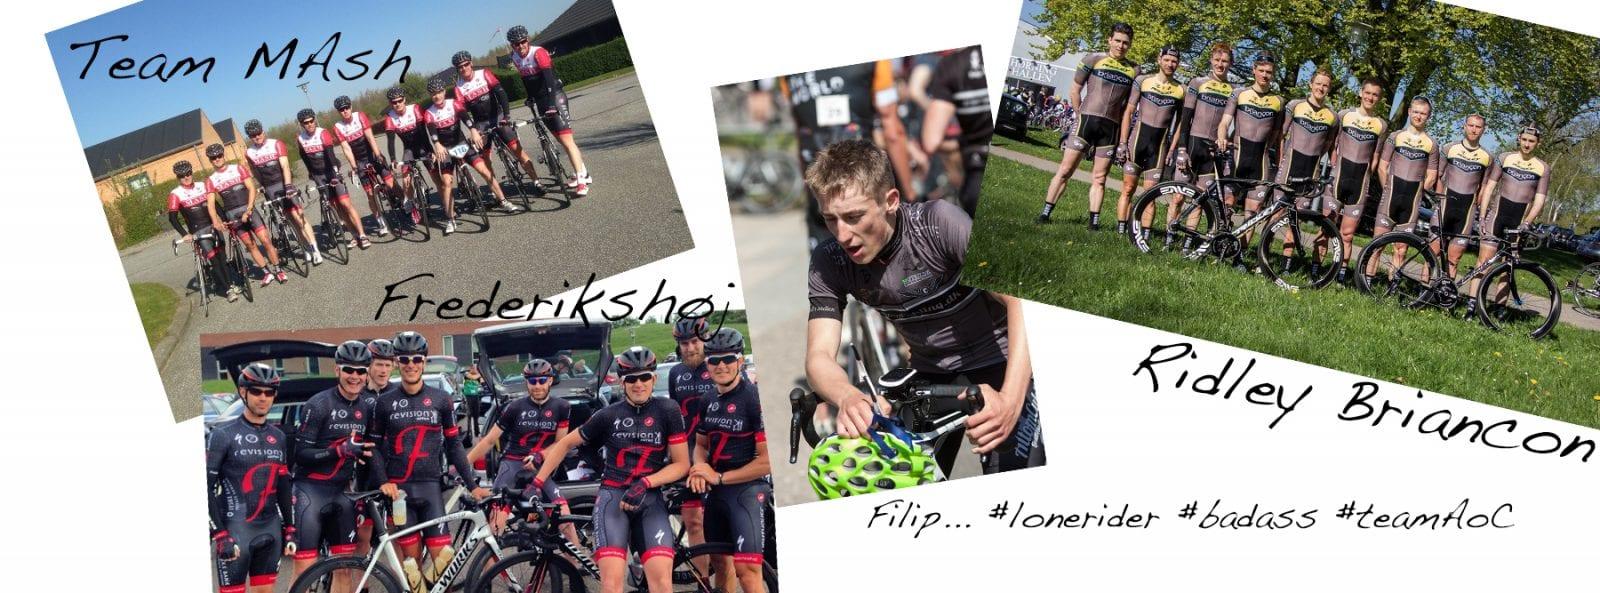 Team MASH, Team Frederikshøj, Team AoC, Team Ridley Briancon 2014